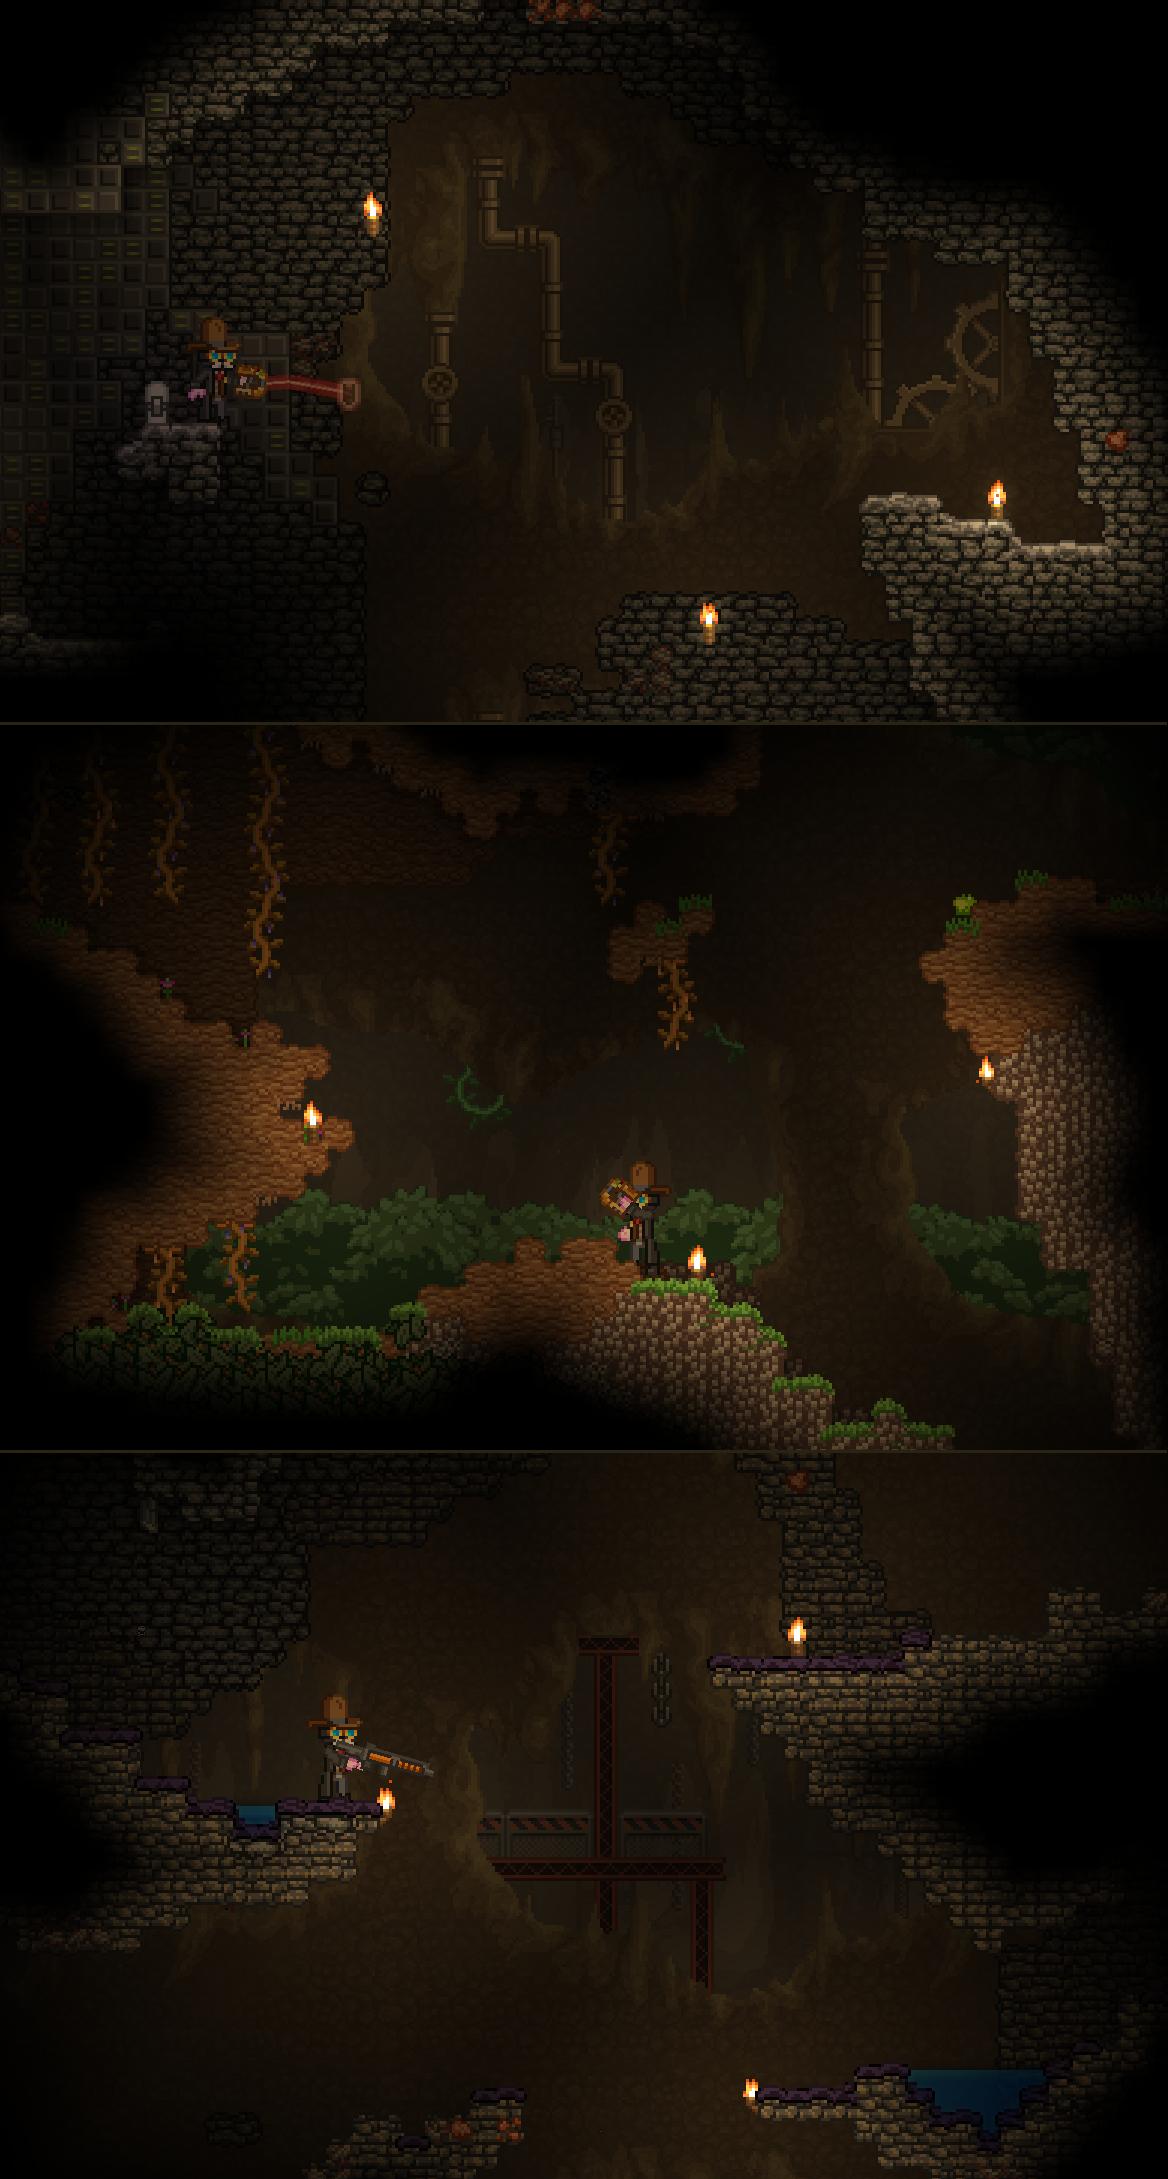 undergroundparallax